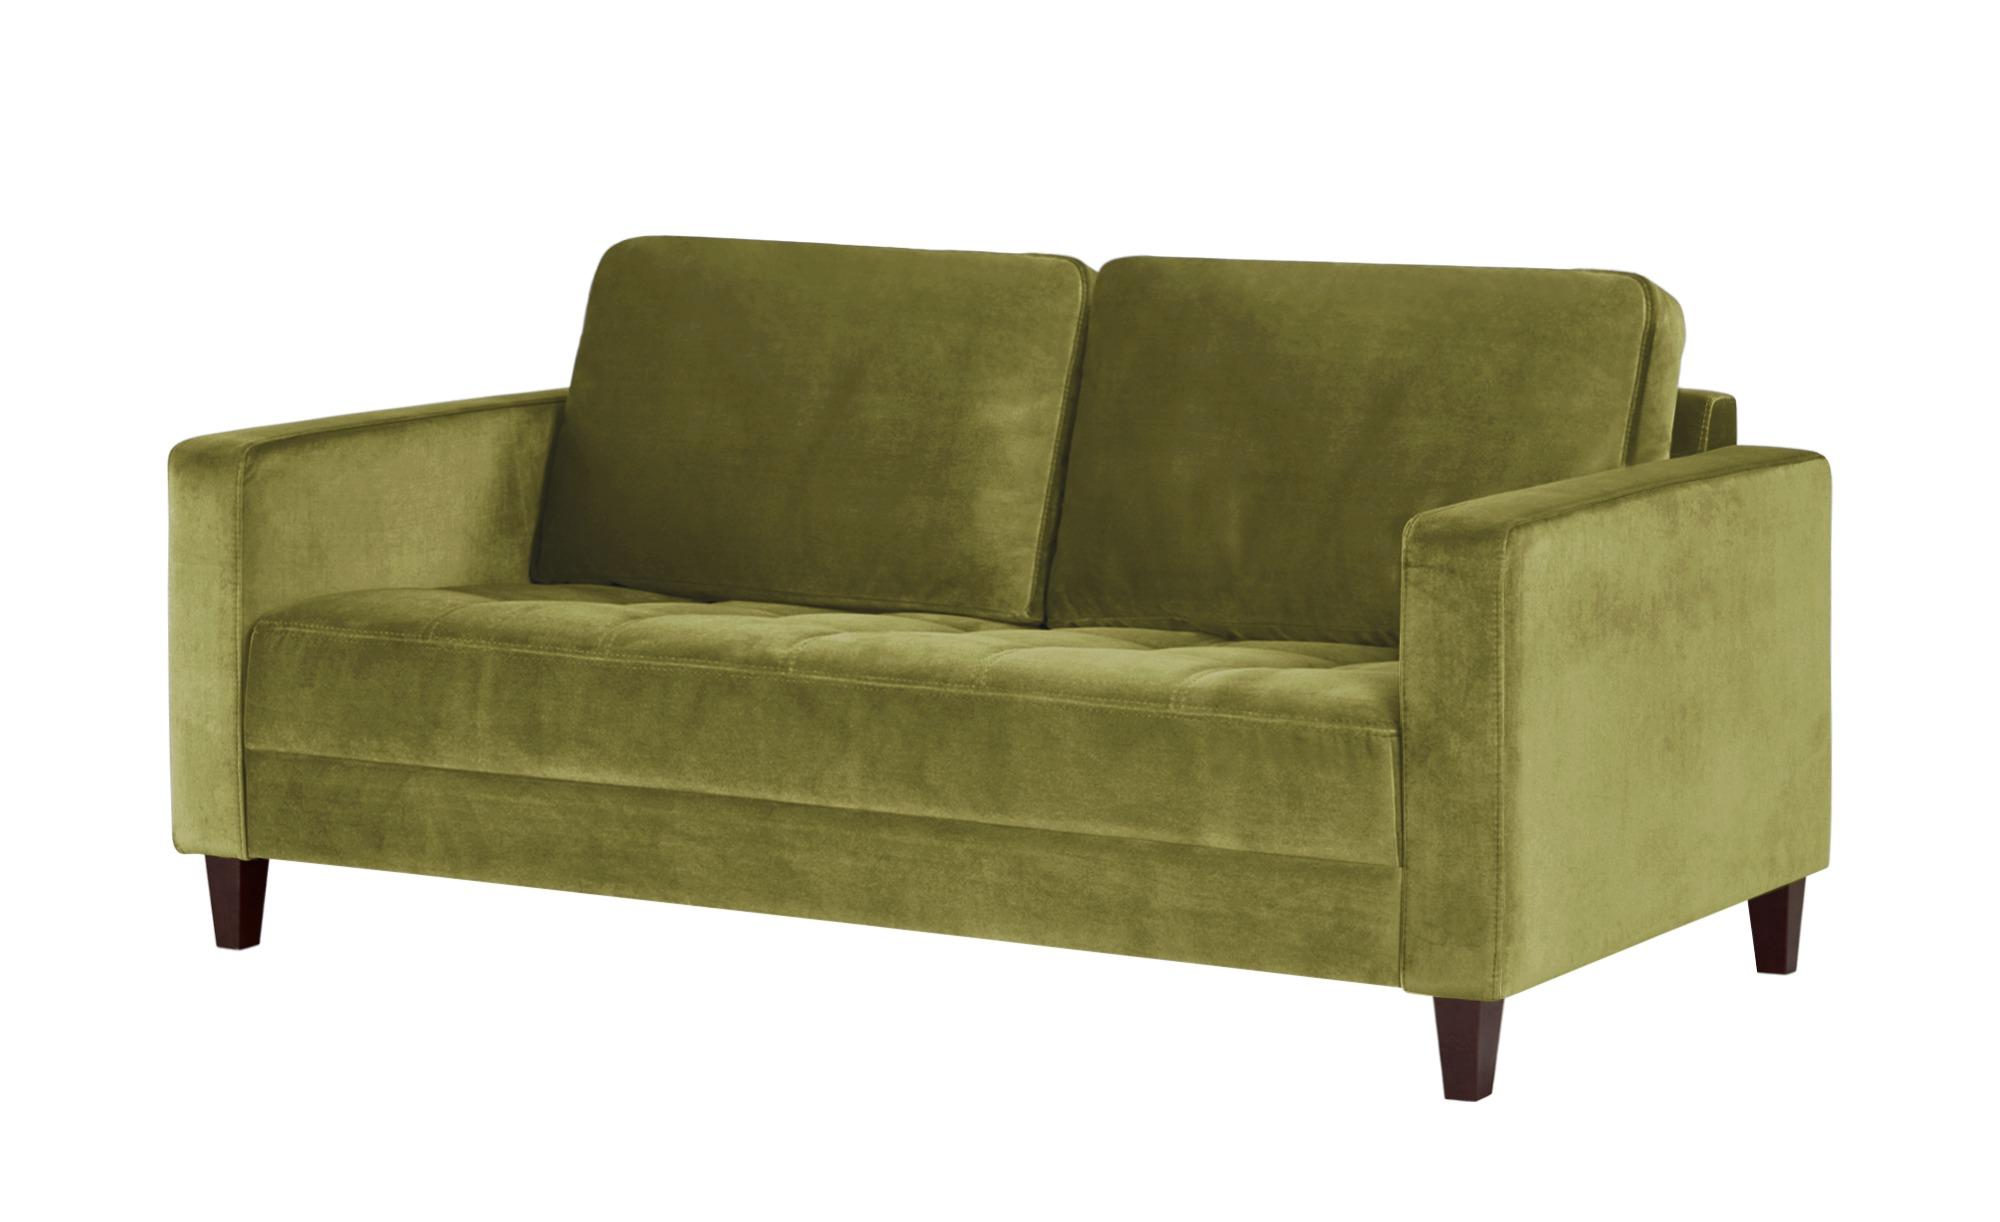 smart Sofa grün - Mikrofaser Geradine ¦ grün ¦ Maße (cm): B: 178 H: 83 T: 91 Polstermöbel > Sofas > 2-Sitzer - Höffner